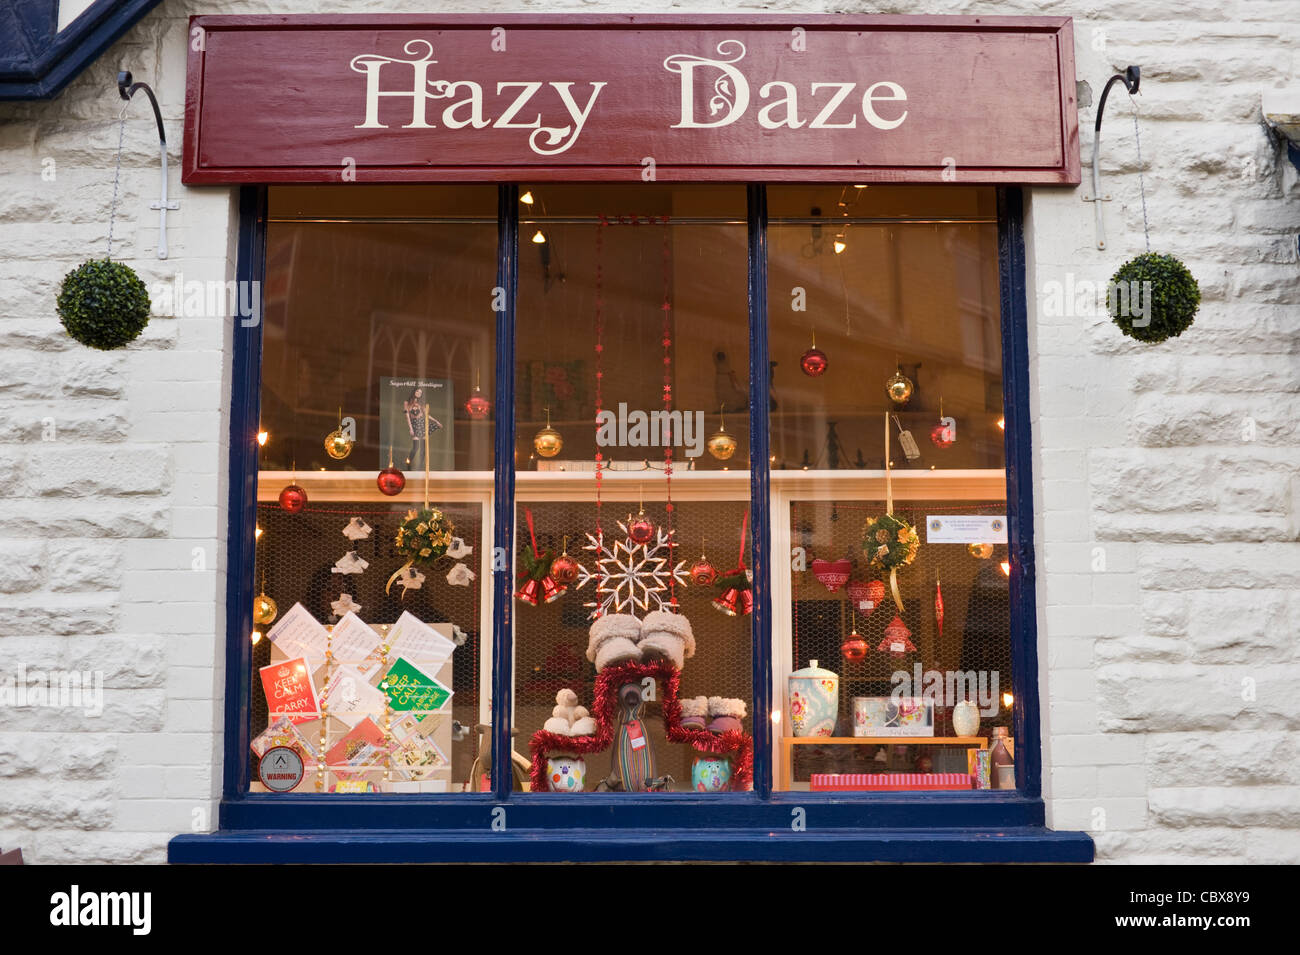 Xmas Christmas window display in Hazy Daze gift shop Hay-on-Wye ...